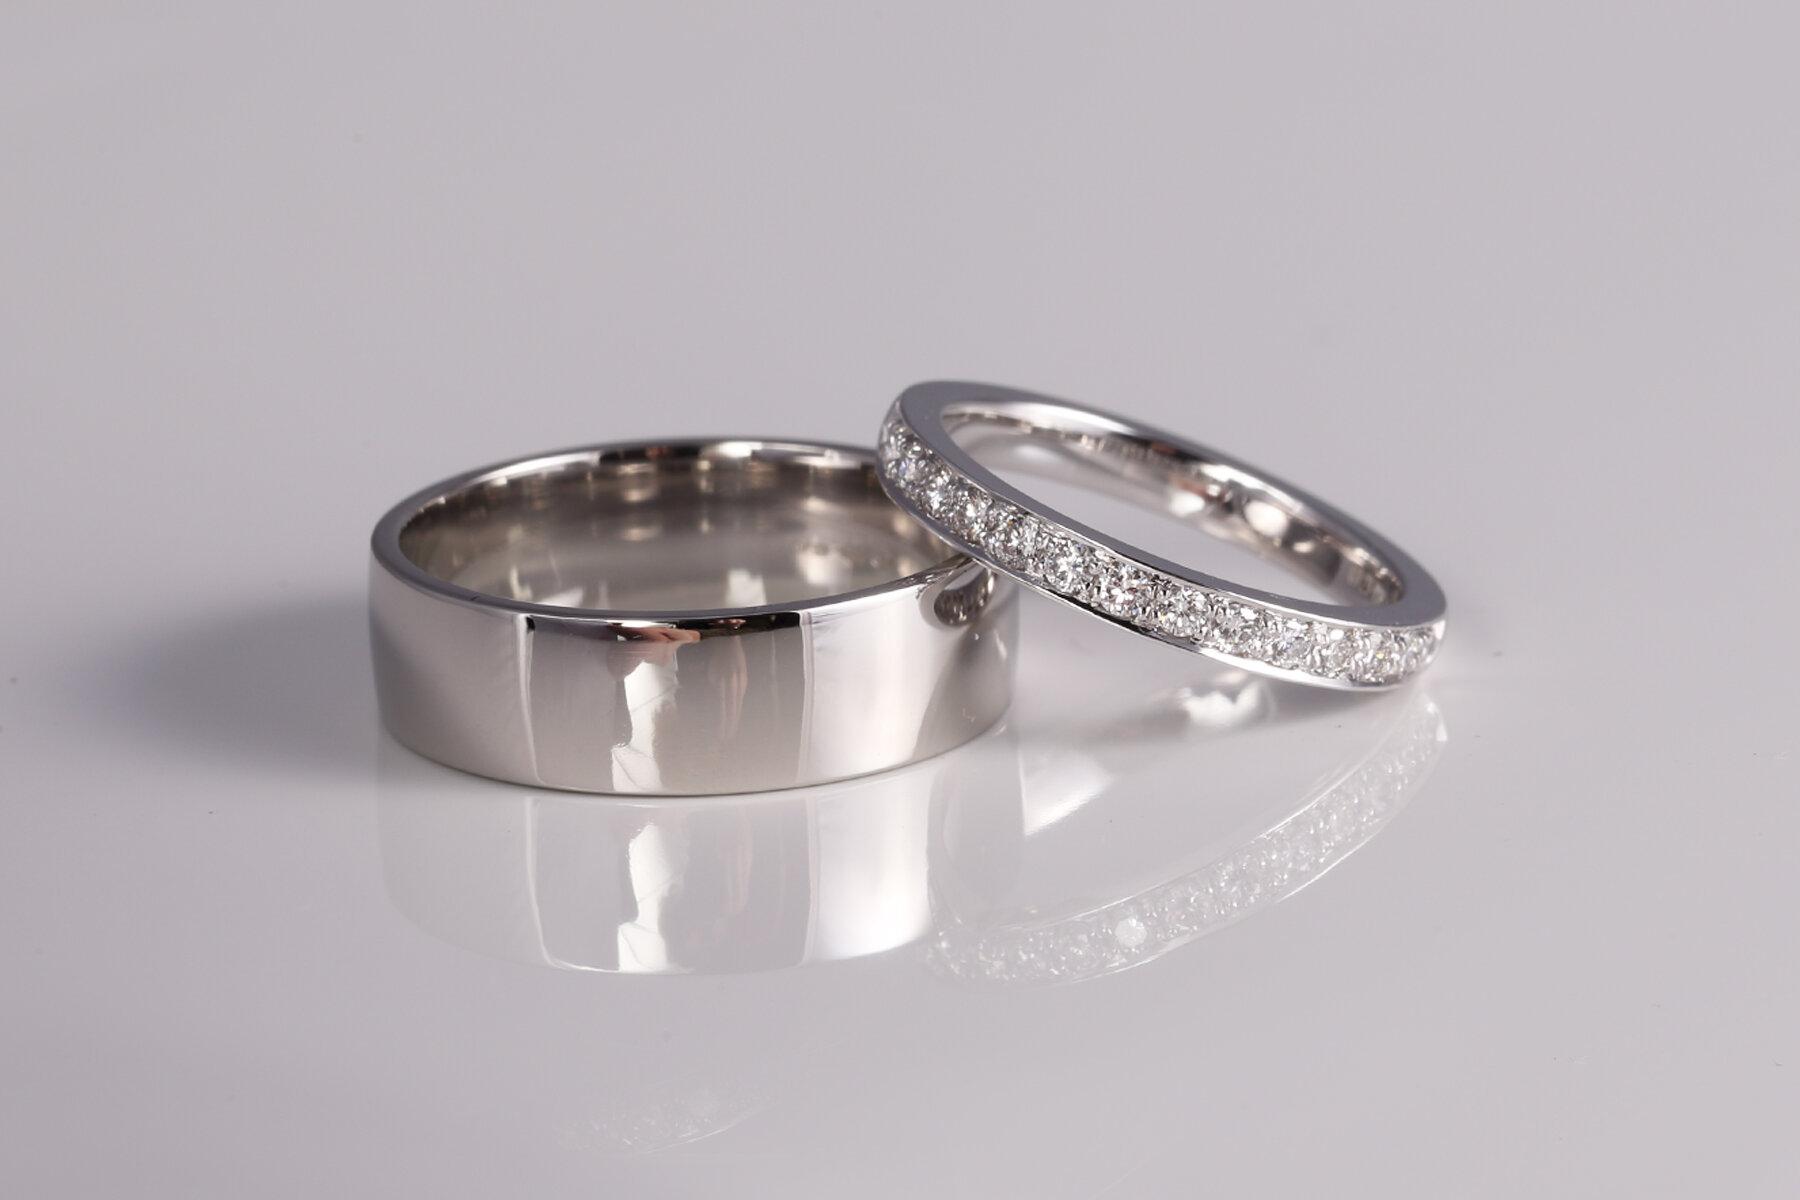 Jamesvealediamond ring combo.jpg